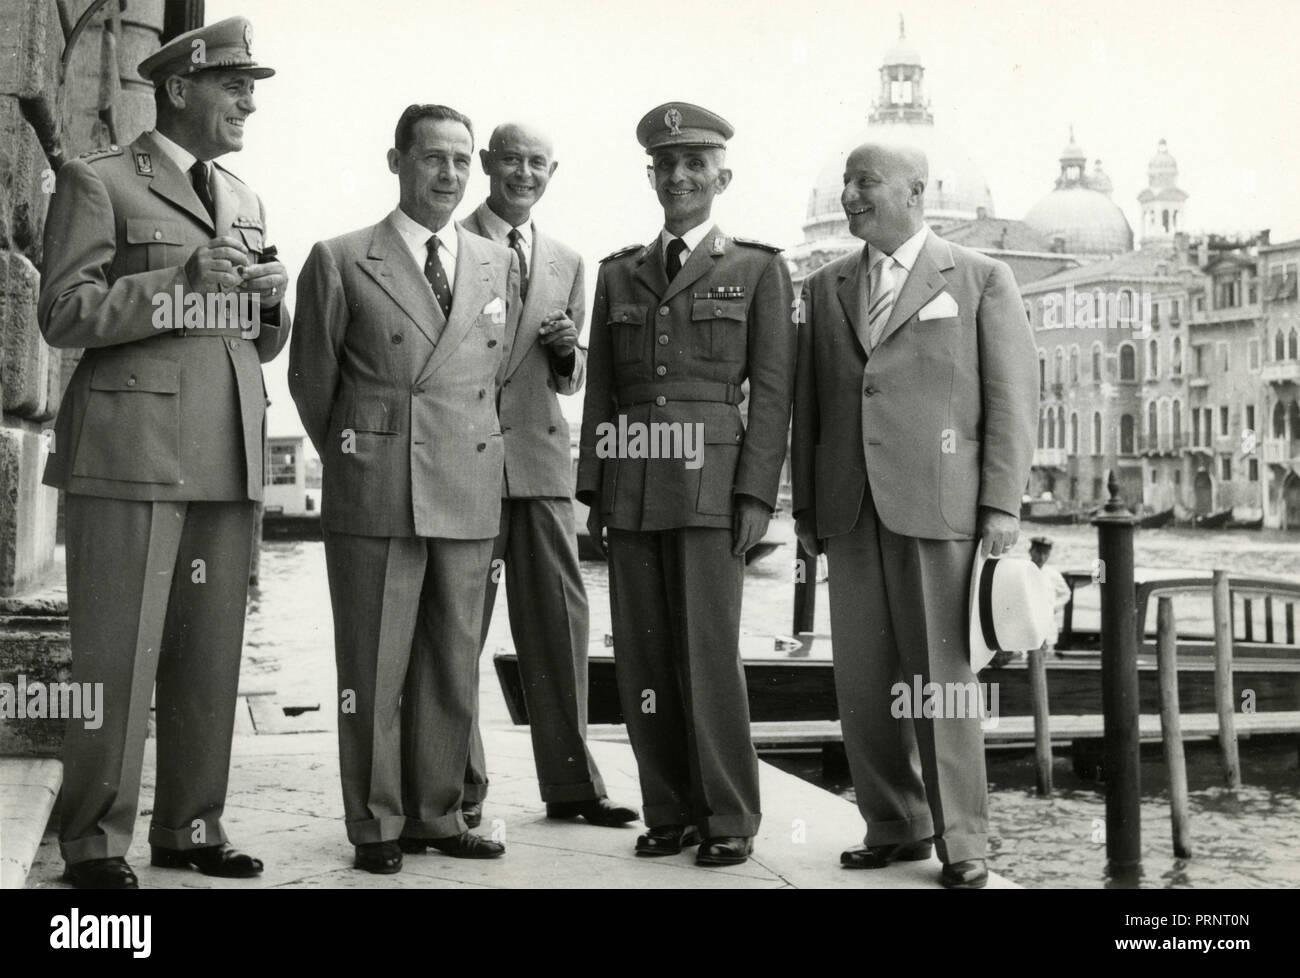 Finance police, Venice, Italy 1955 - Stock Image